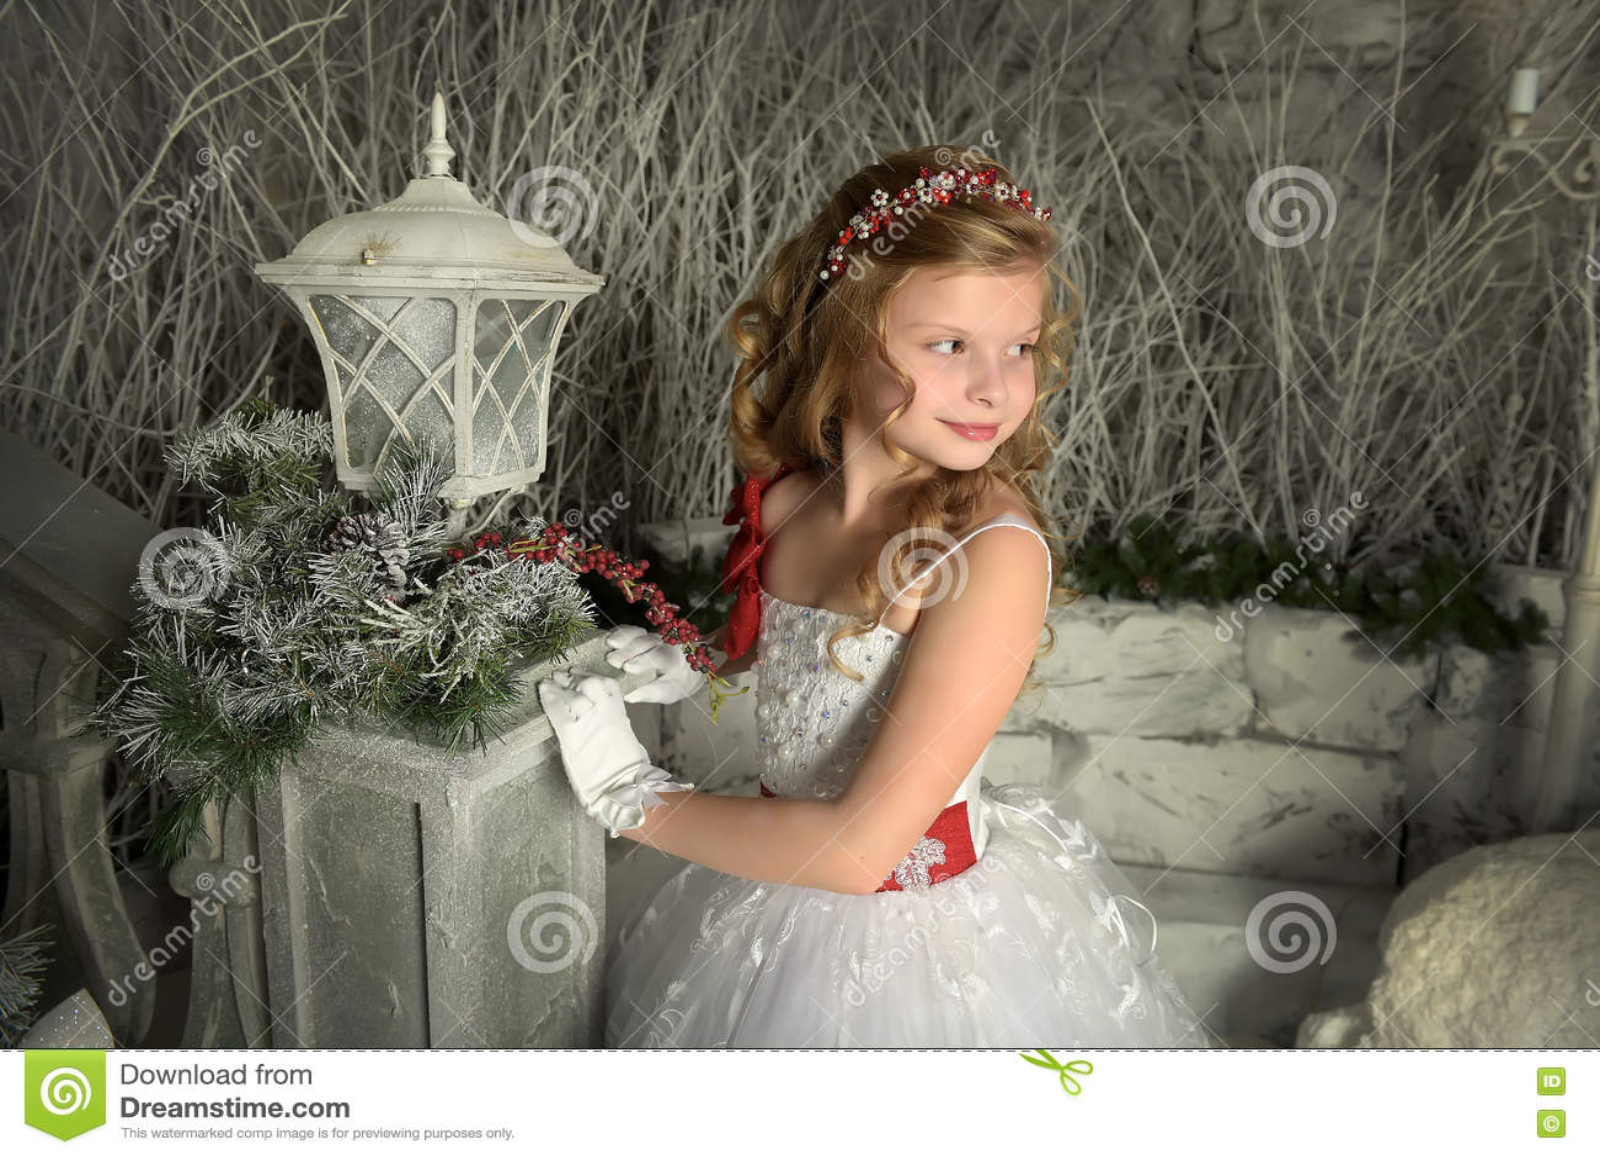 8b326255b9a Όμορφο ξανθό κορίτσι σε ένα έξυπνο άσπρο φόρεμα Φωτογραφίες στο αναδρομικό  ύφος